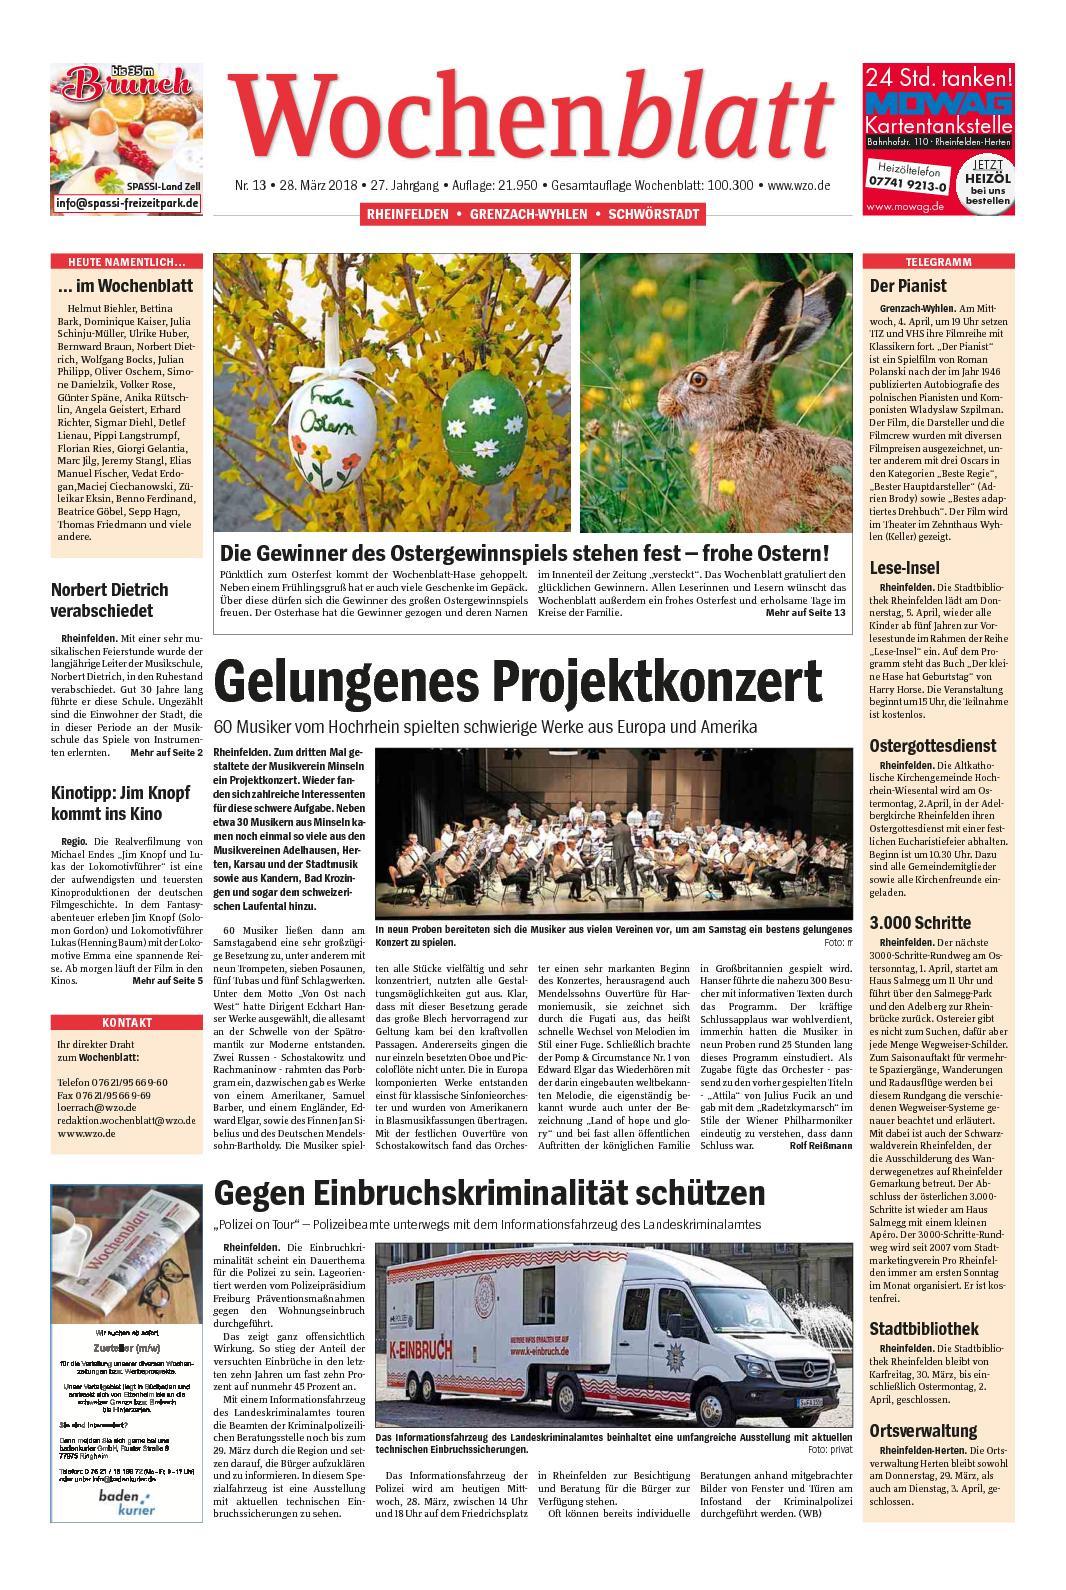 Pippi Langstrumpf Akkorde Neu Calaméo Wochenblatt Rheinfelden Das Bild